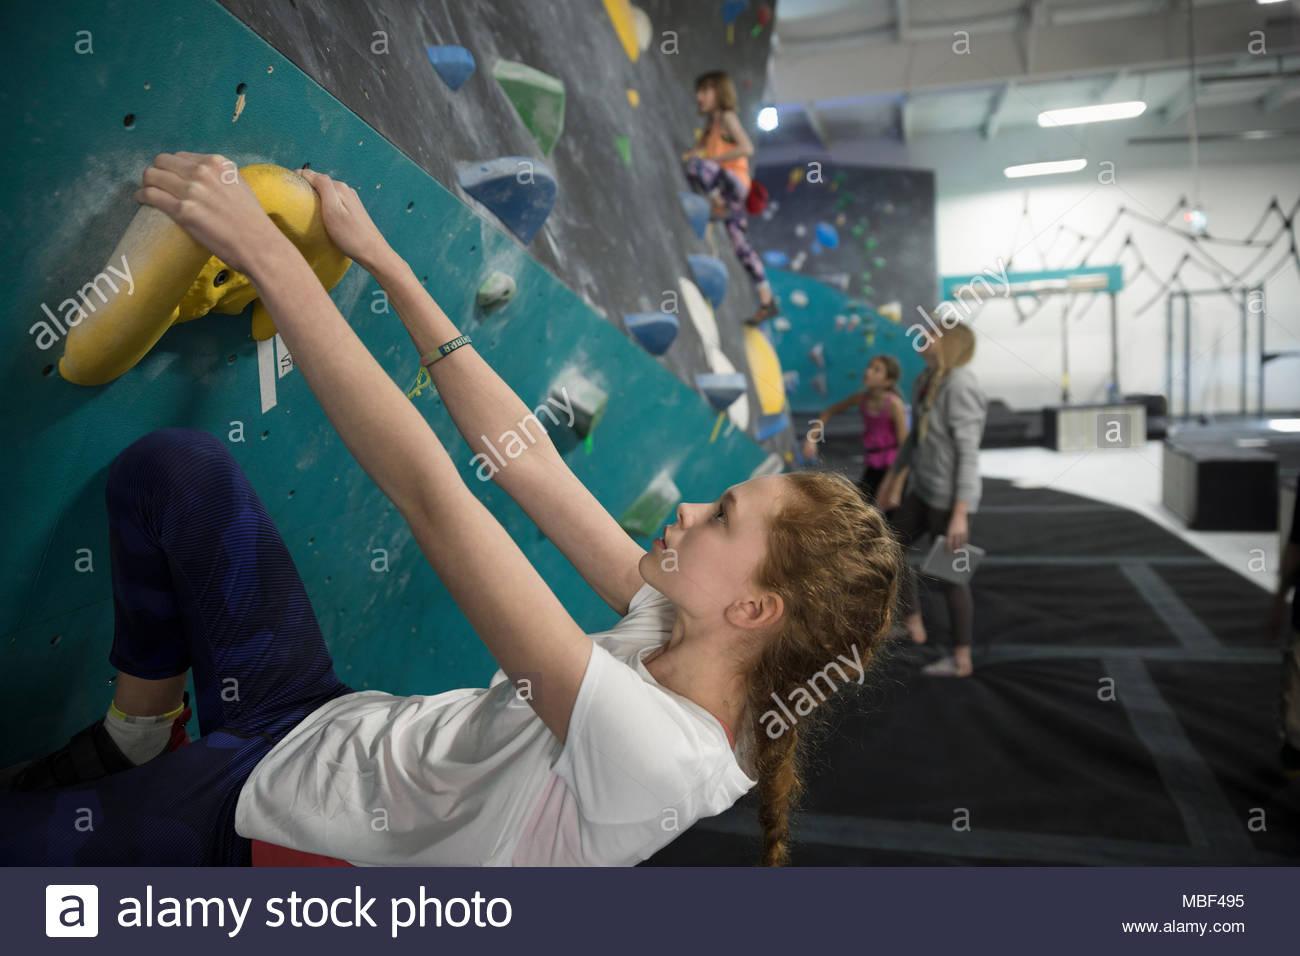 Focused, strong girl rock climber climbing wall in climbing gym - Stock Image